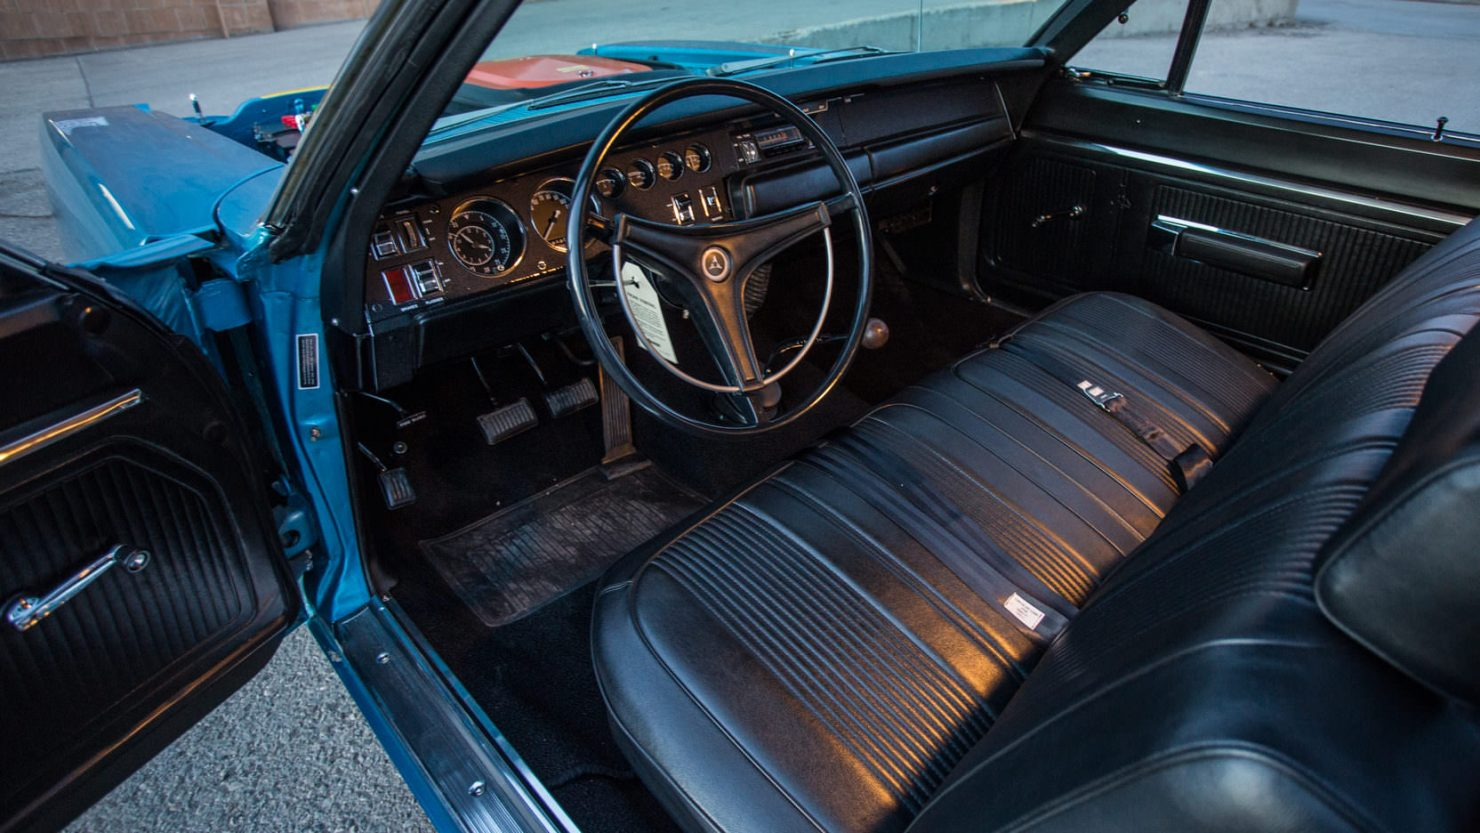 Dodge Super Bee 9 1480x833 - 1969 Dodge Super Bee 440 Six Pack